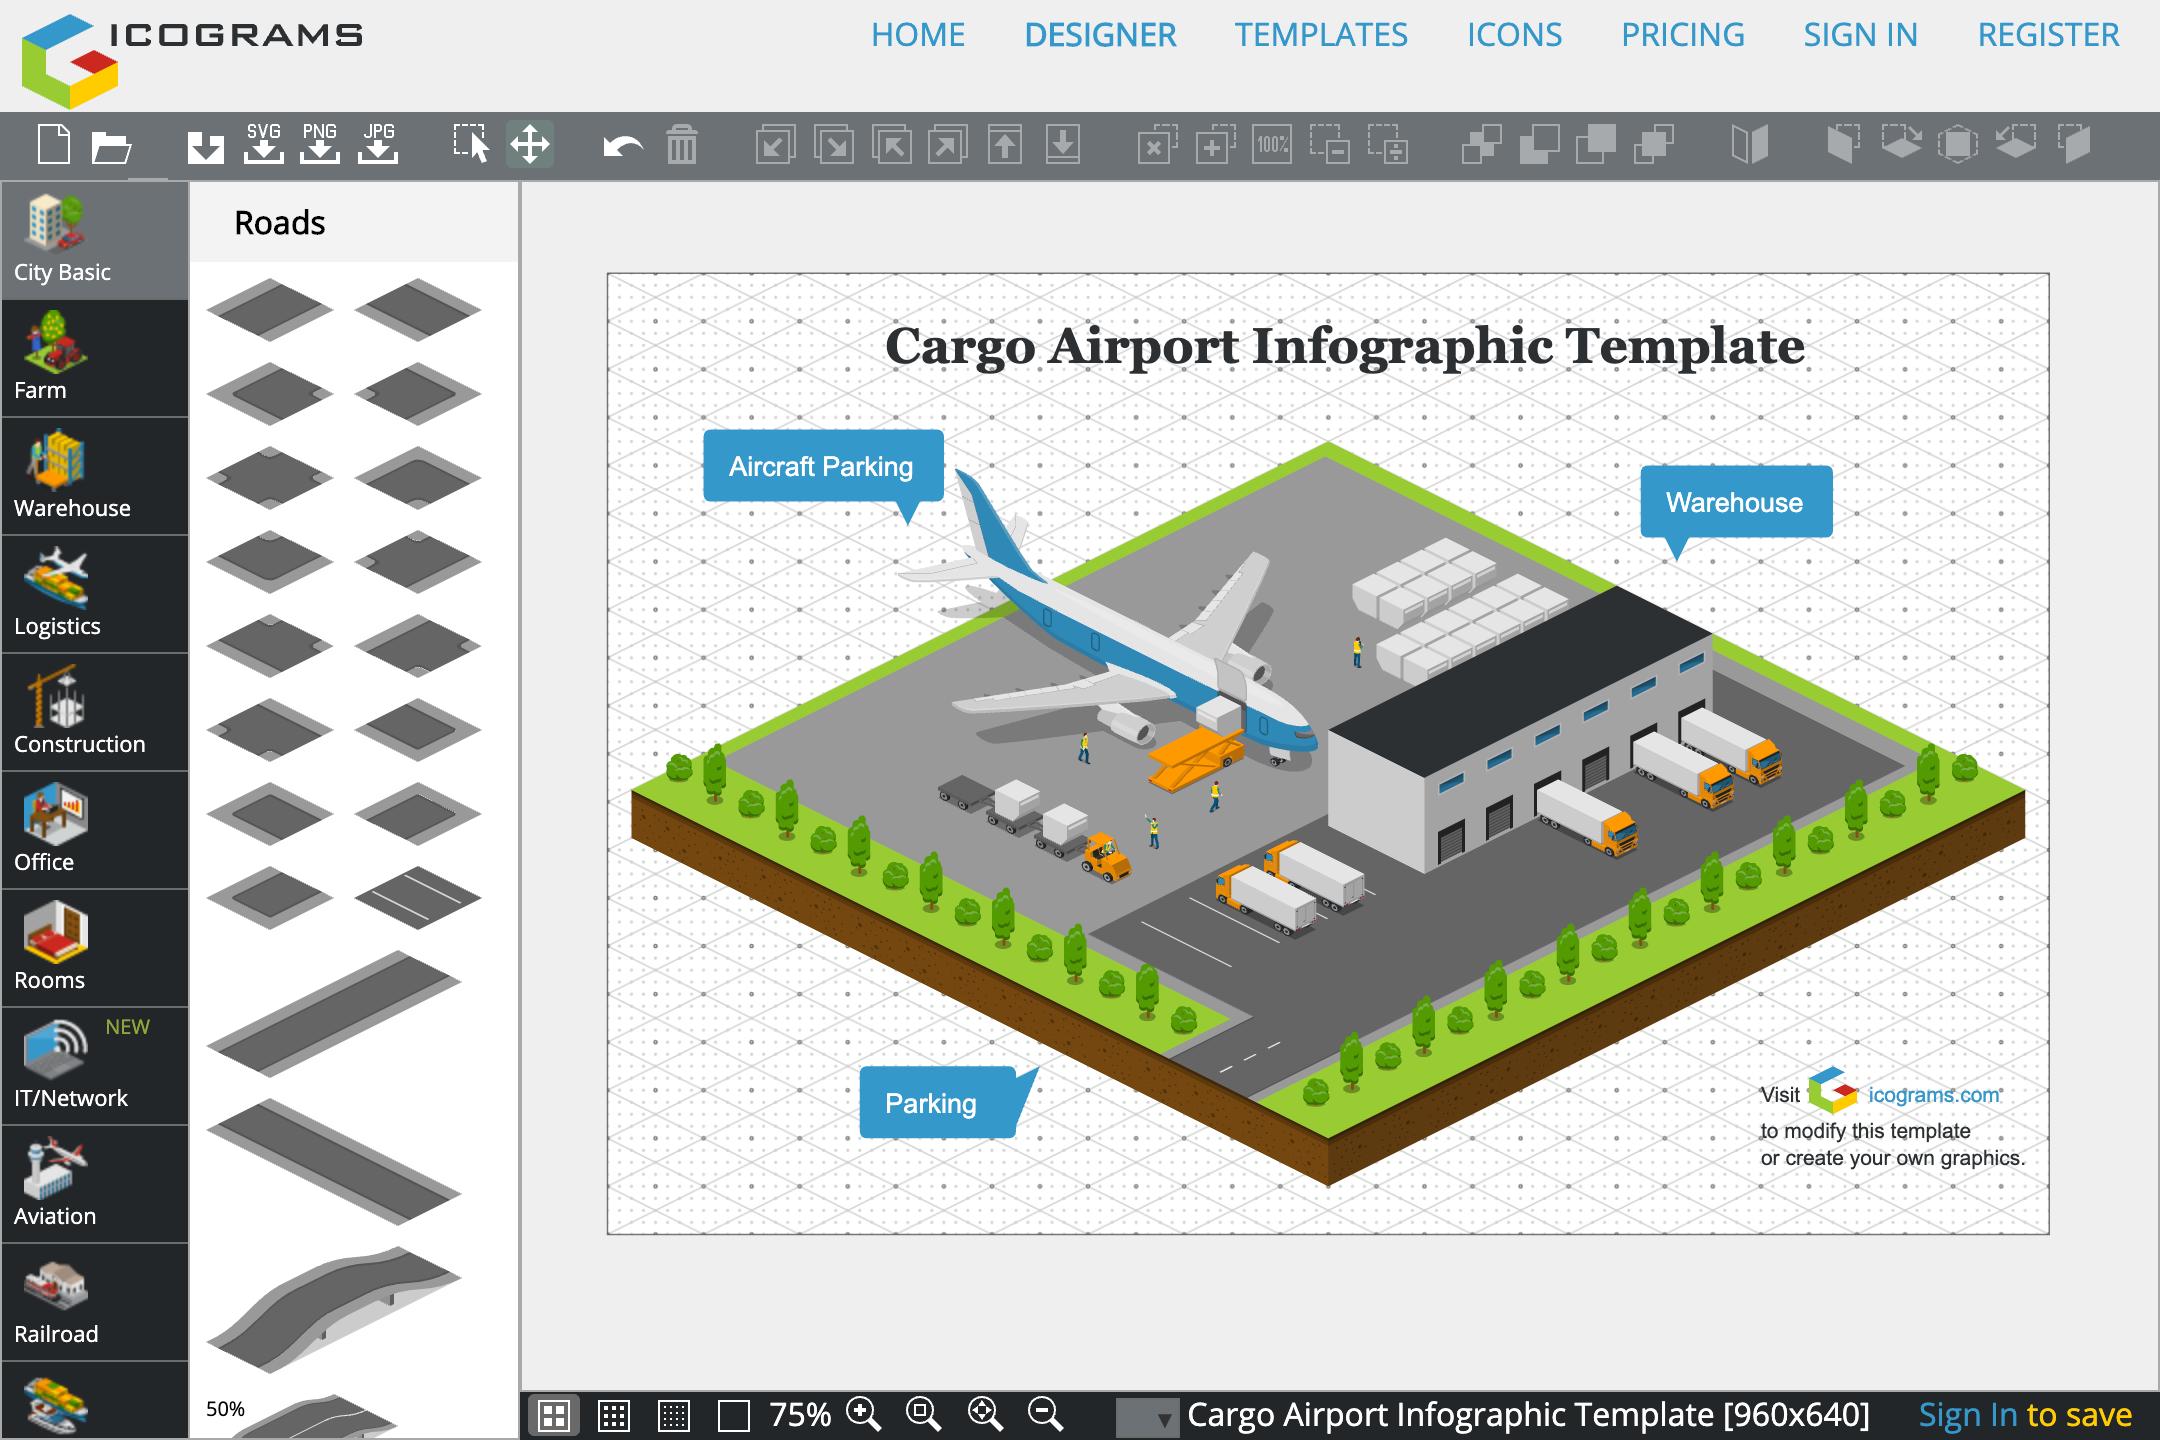 icograms.com_icograms-designer.php.png (805.1 kB)